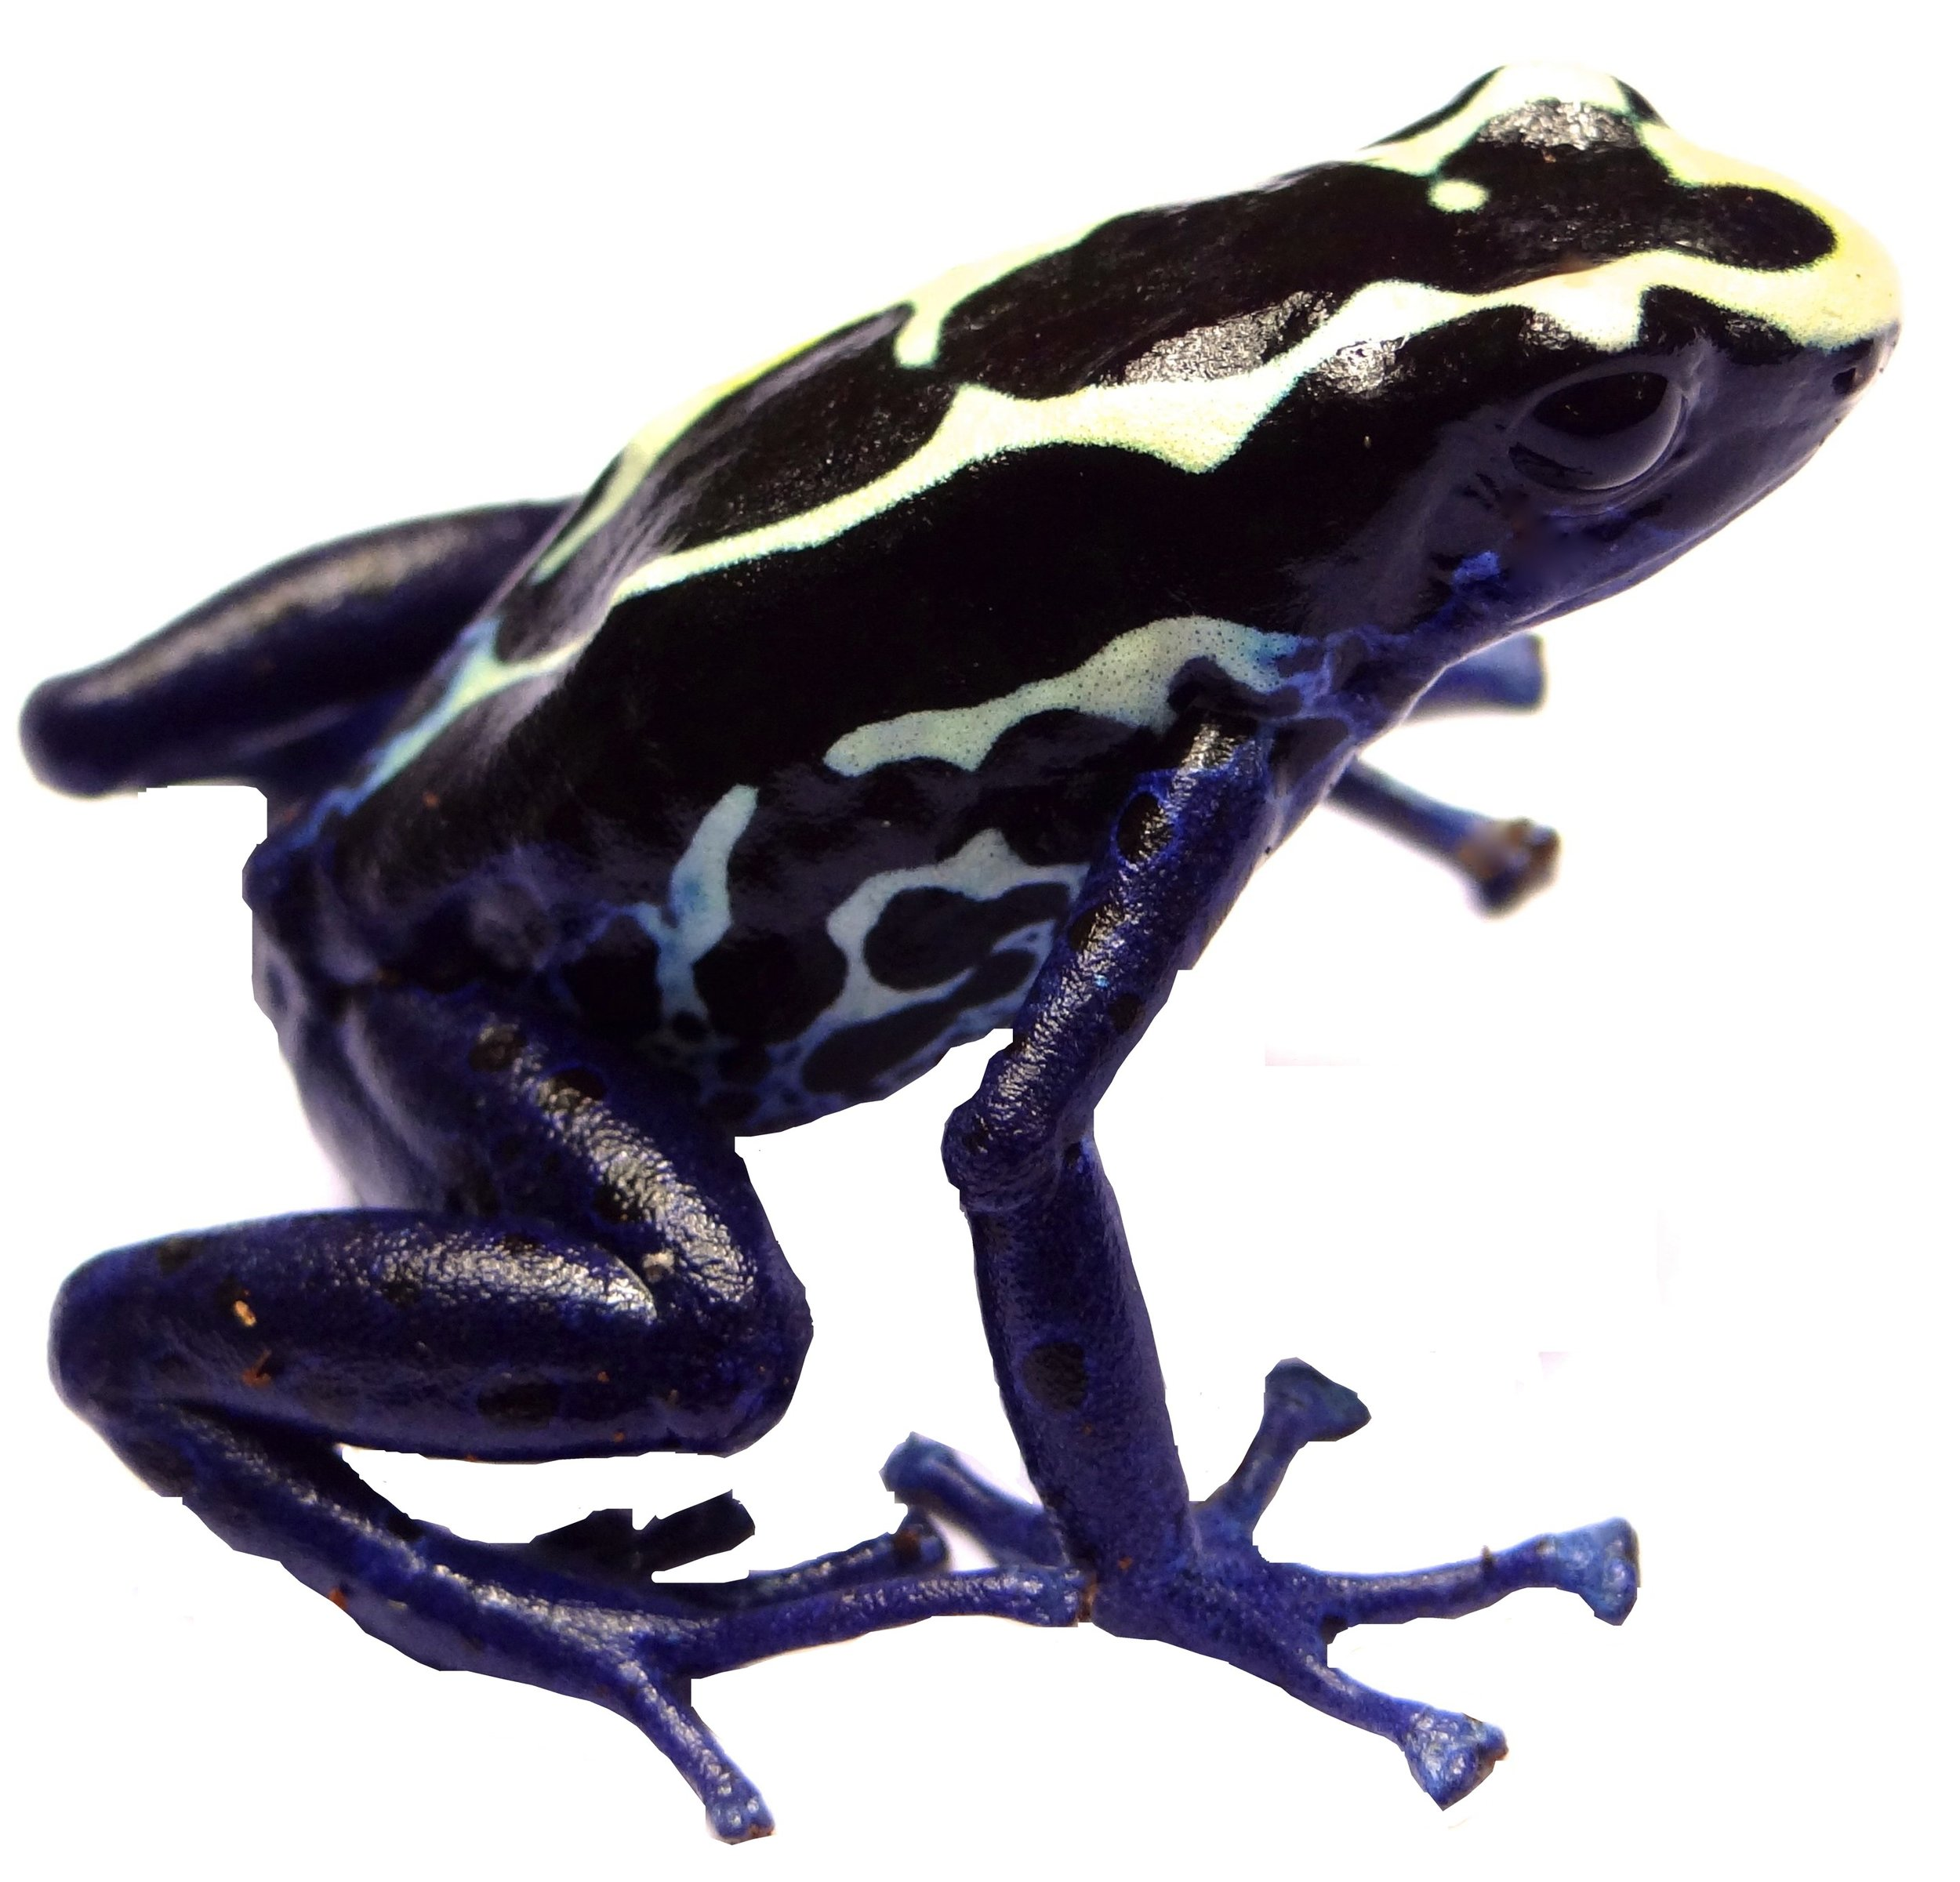 White type of the Dyeing Poison-Frog,  Dendrobates tinctorius.      Image by B. Rojas.